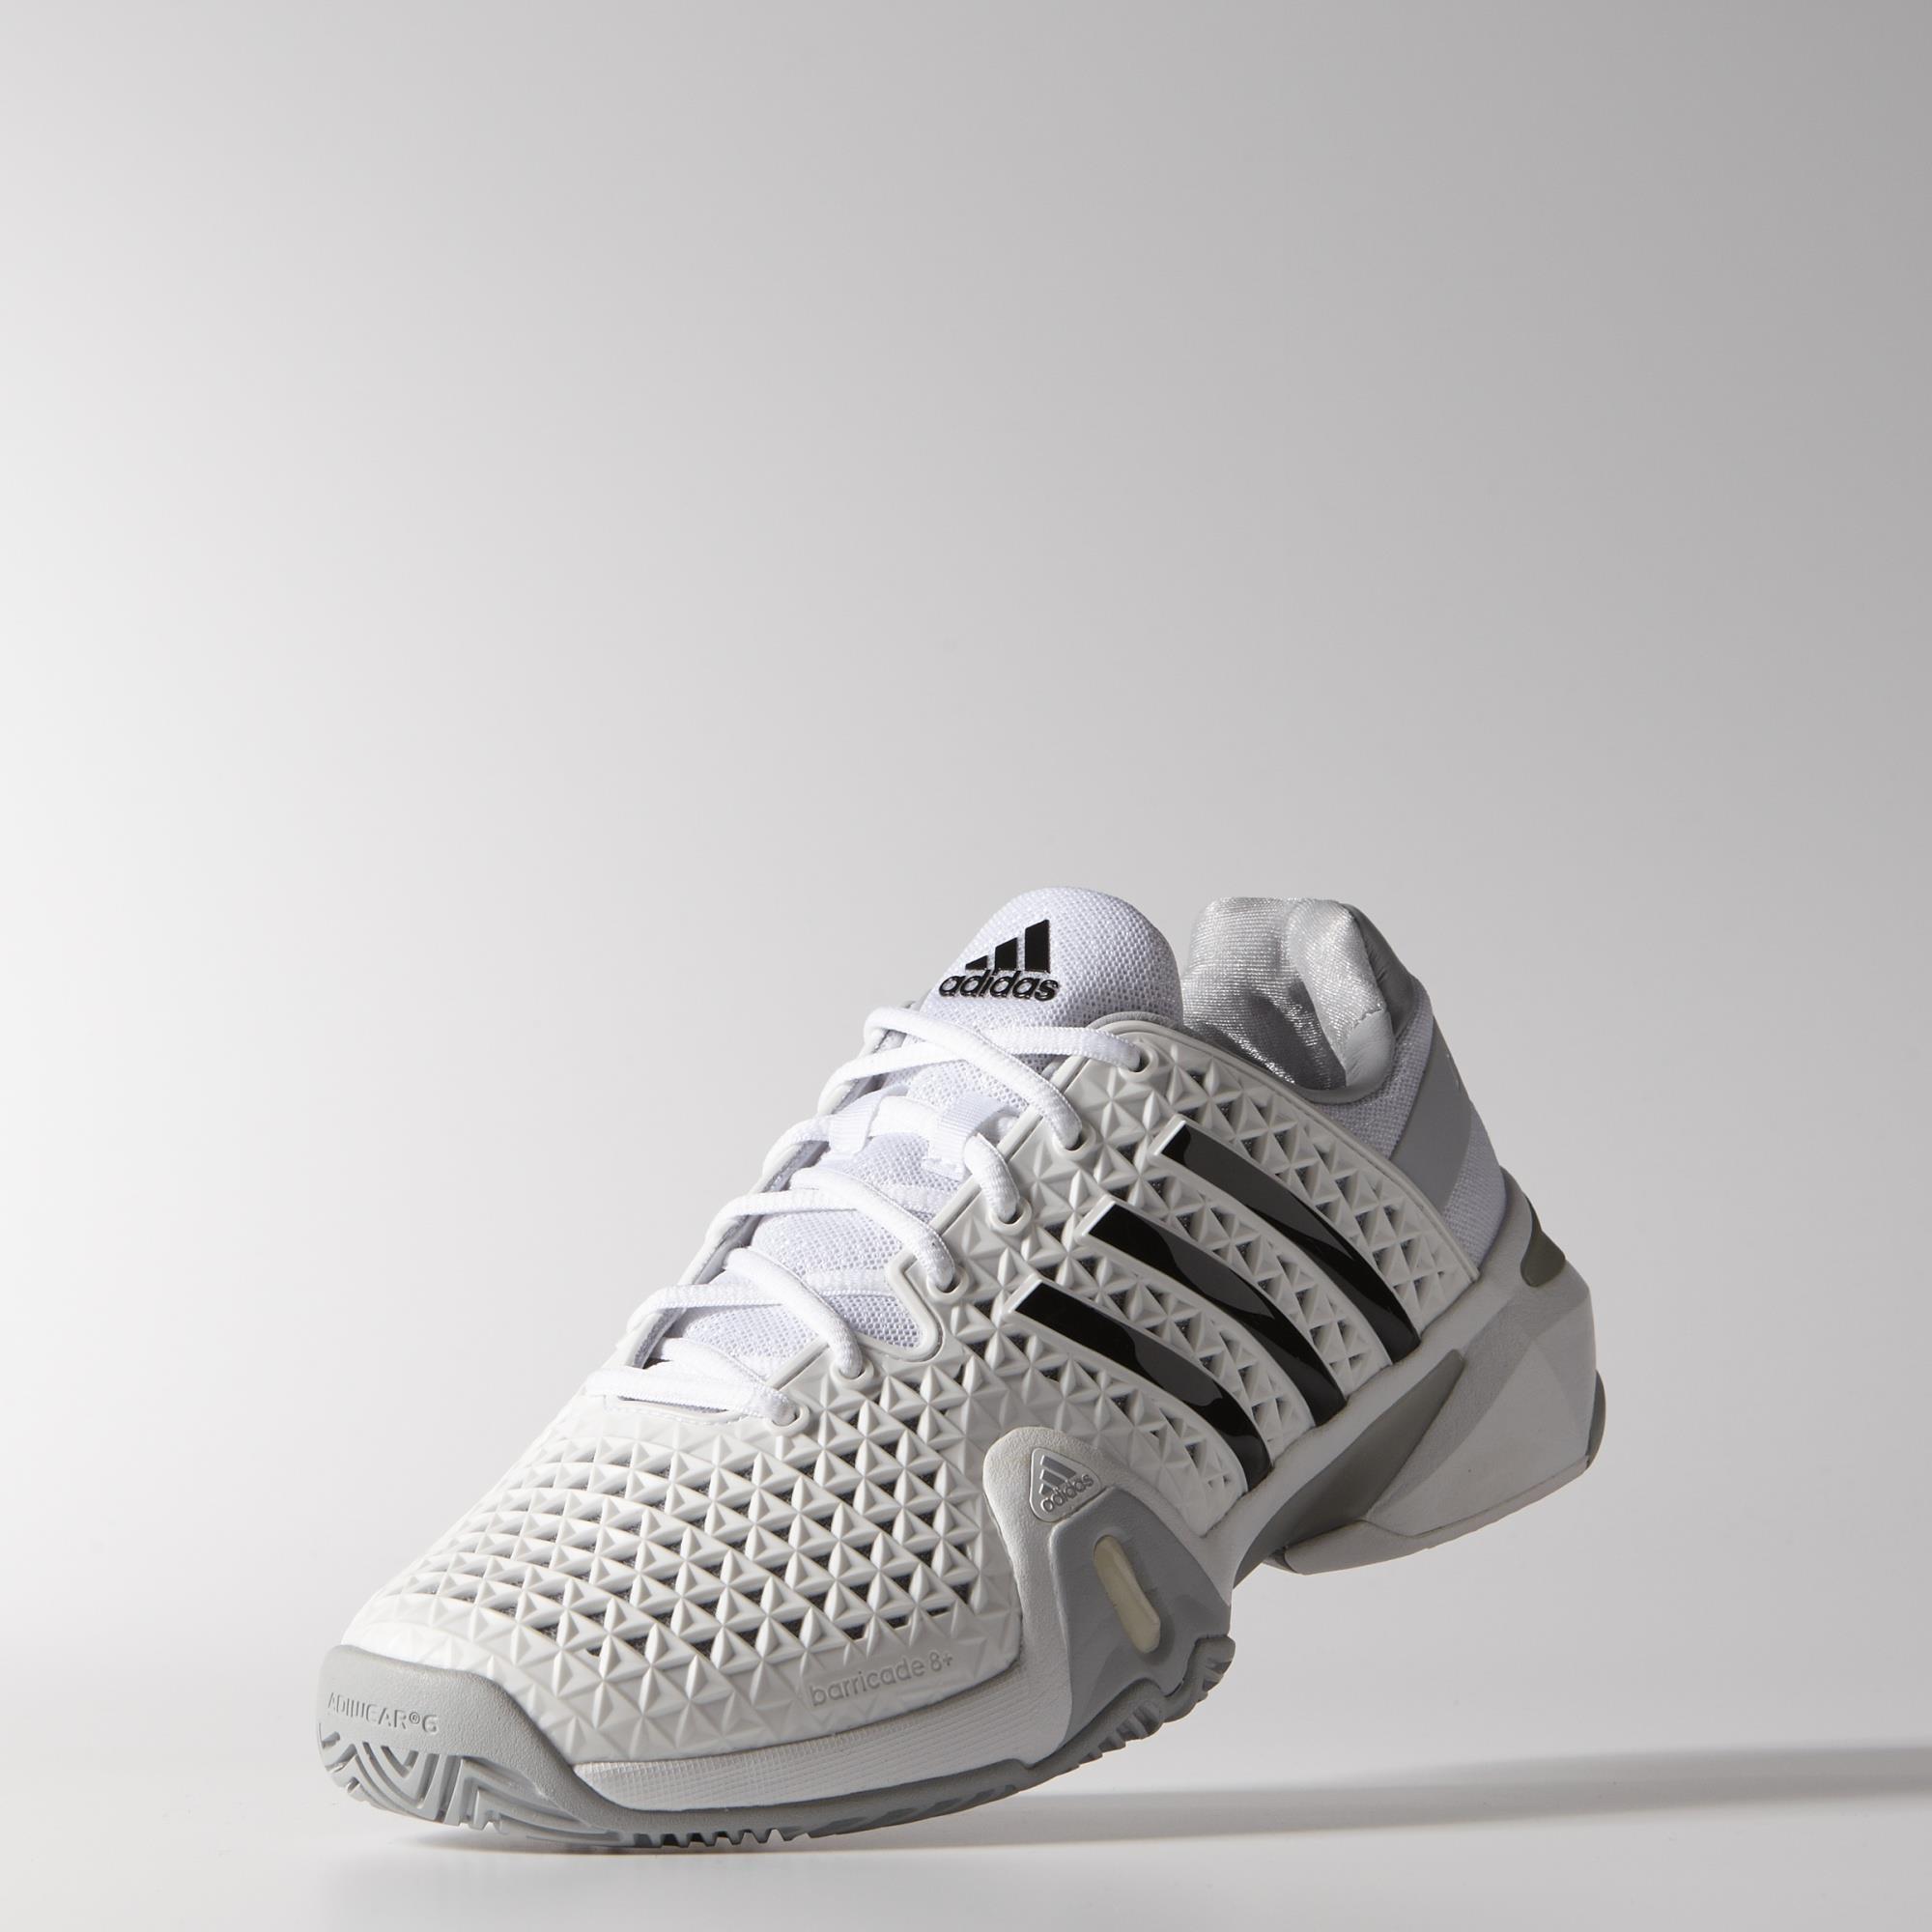 Adidas Adipower Barricade  Mens Tennis Shoes